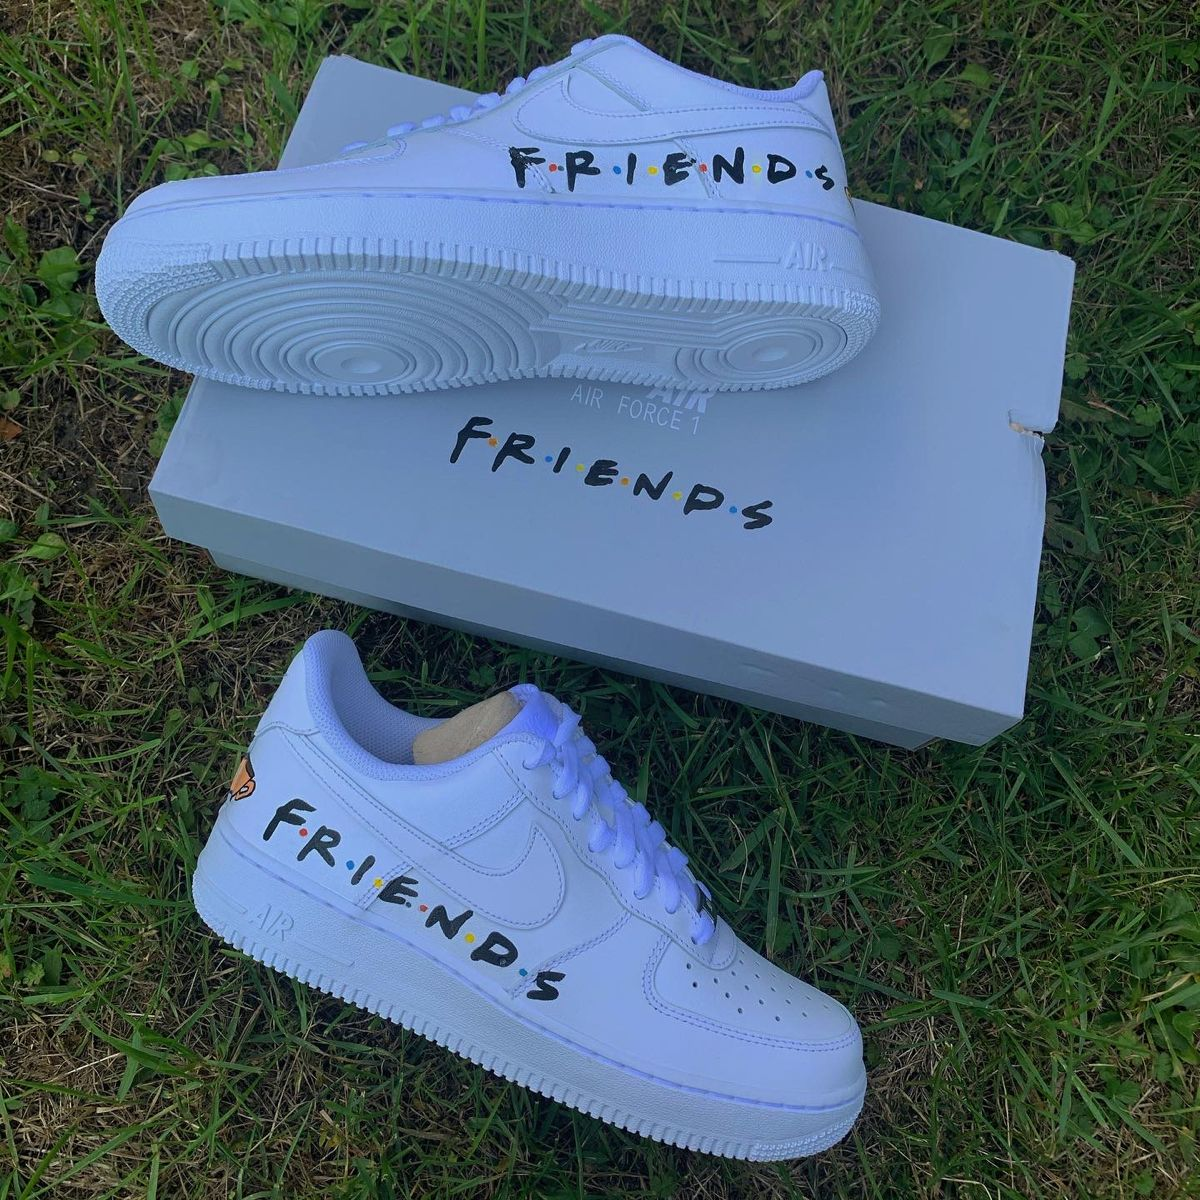 Friends custom Air Force one